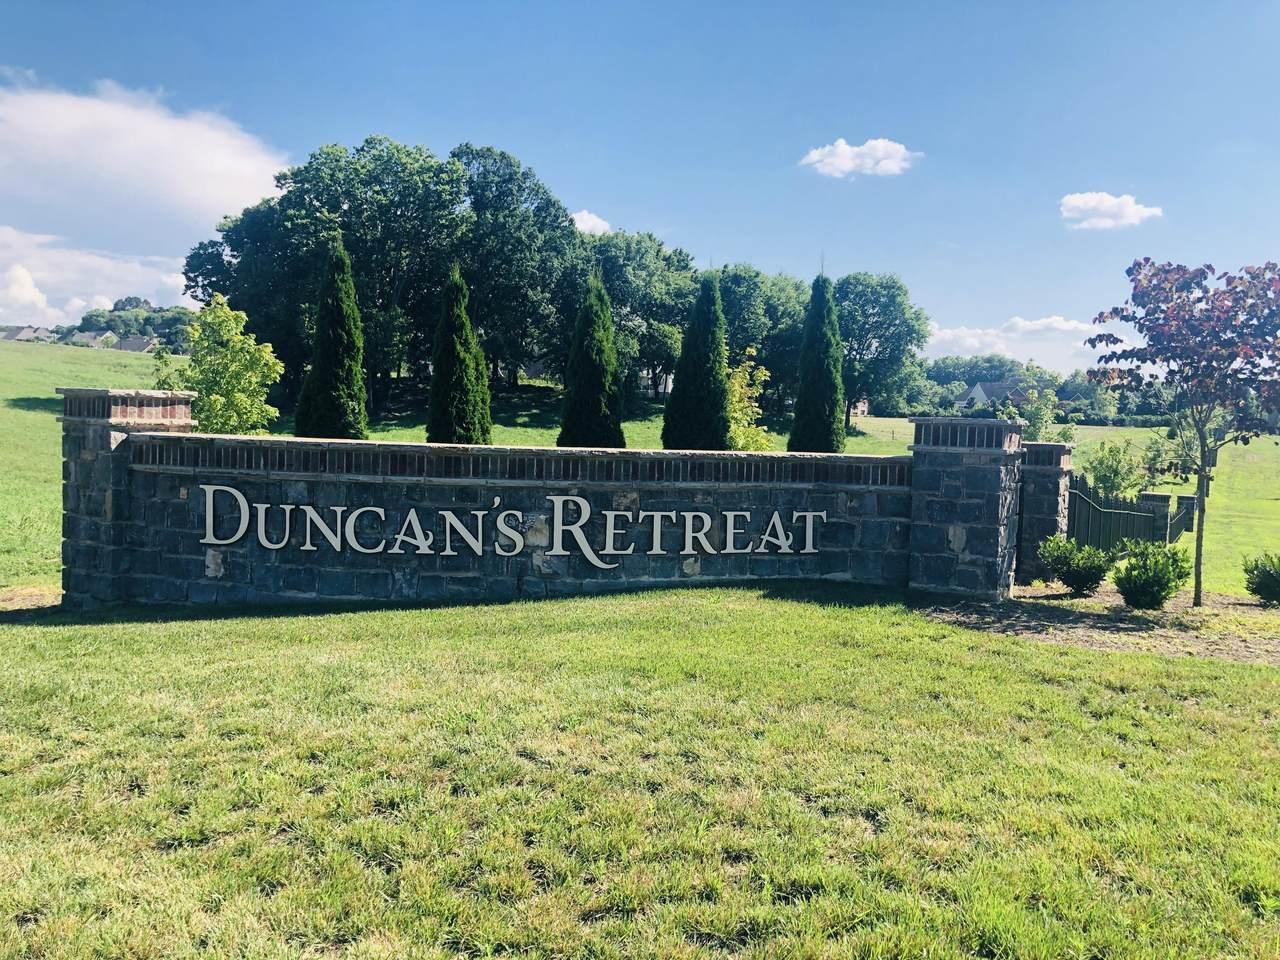 Tbd Duncan's Retreat Lot 12 - Photo 1